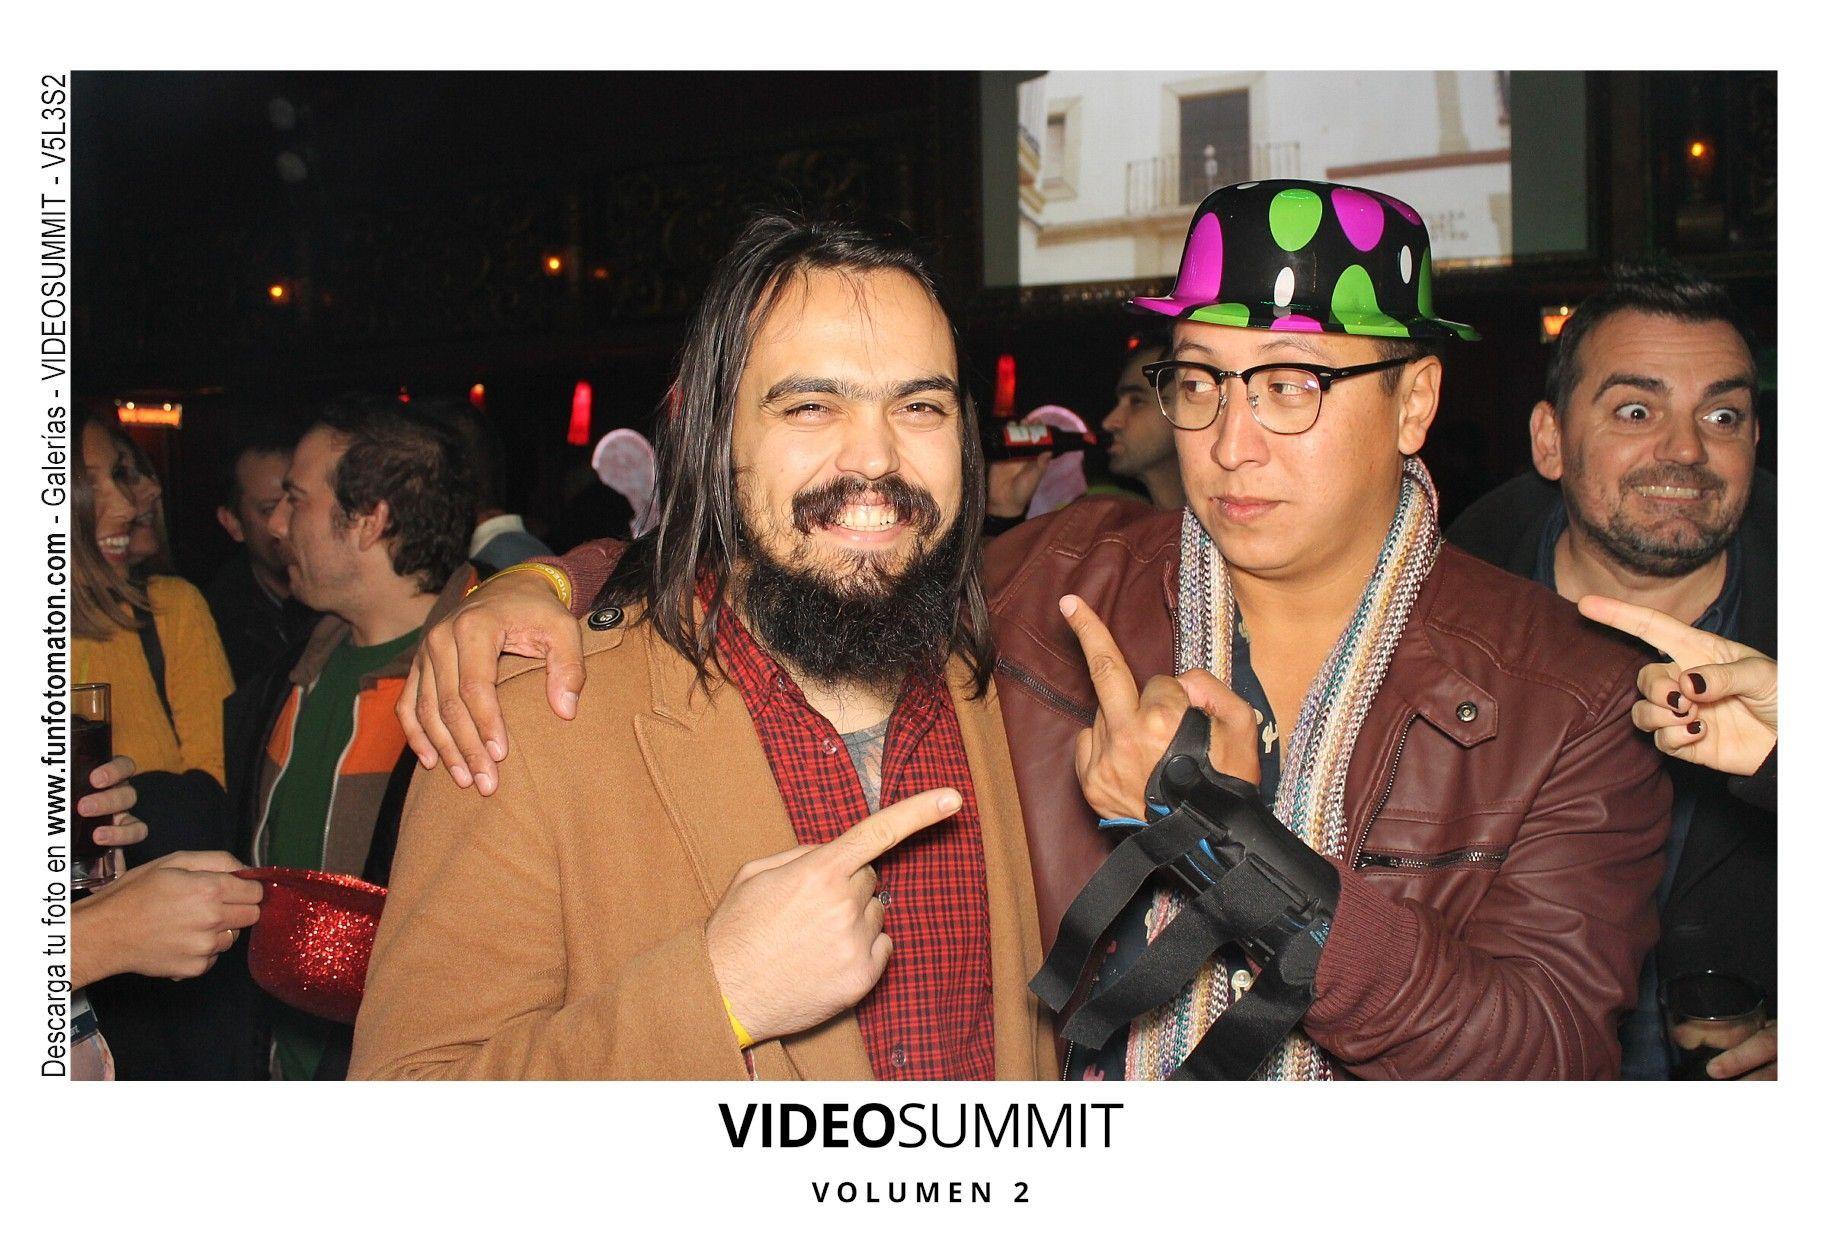 videosummit-vol2-club-party-022